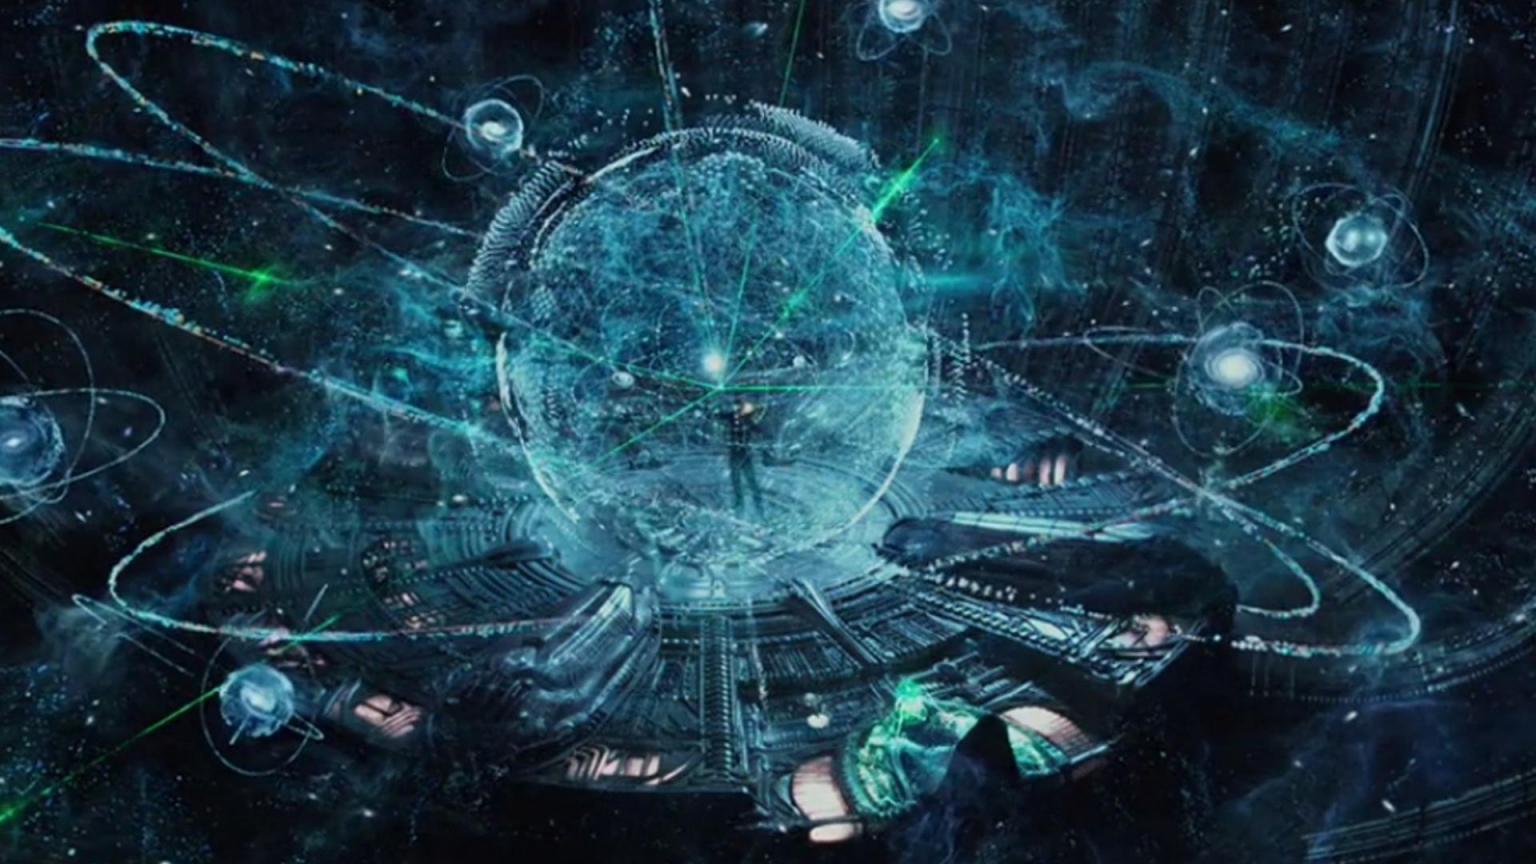 download Outer space predator prometheus alien starmap 1536x864